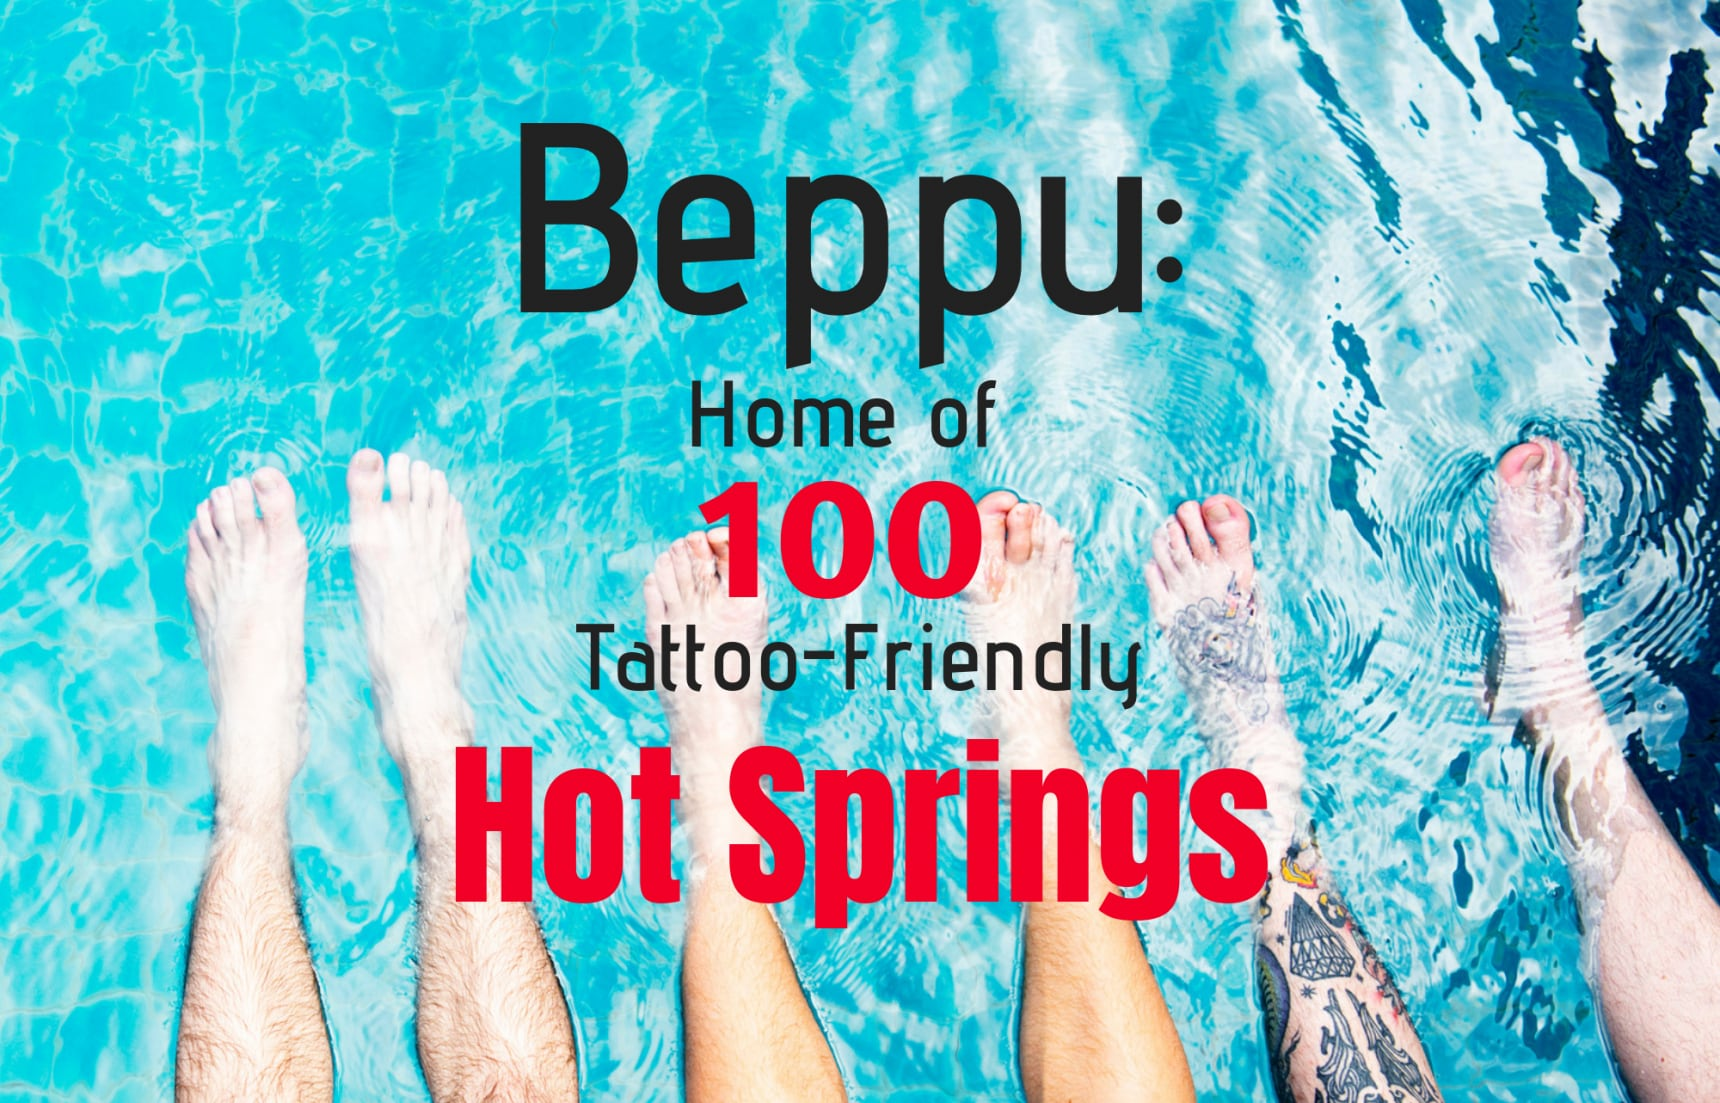 Beppu: Home of 100 Tattoo-Friendly Hot Springs